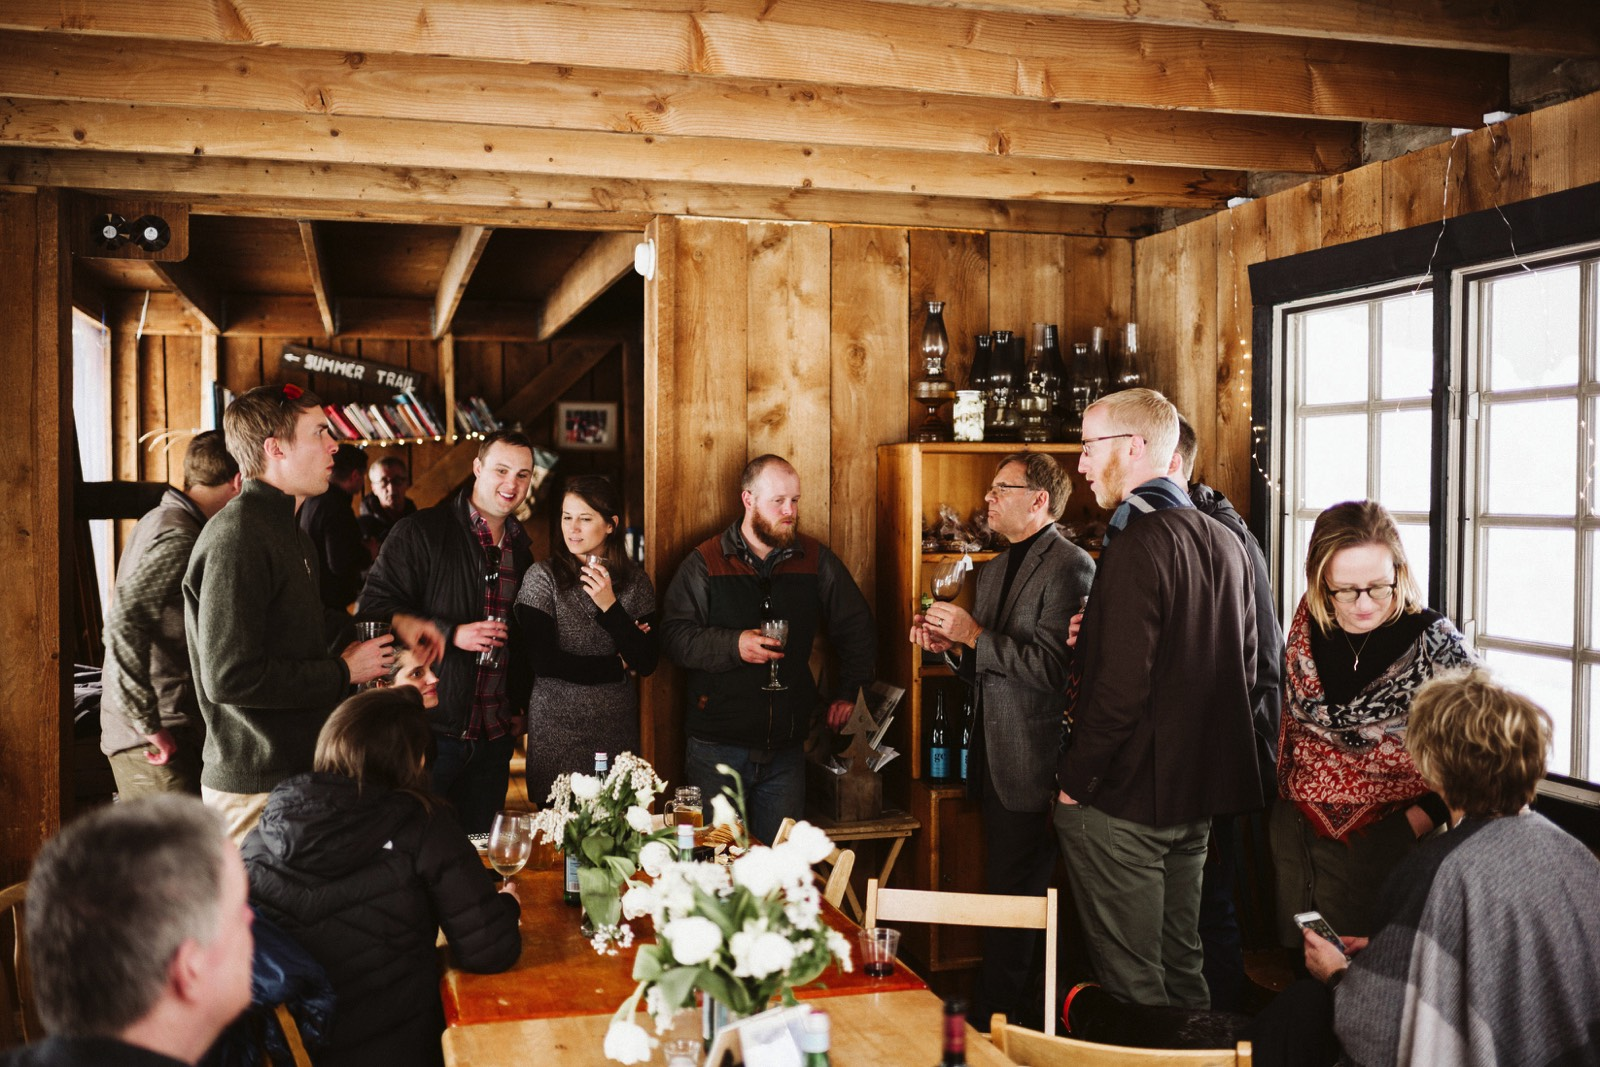 alpine-lakes-high-camp-winter-wedding-68 ALPINE LAKES HIGH CAMP WEDDING